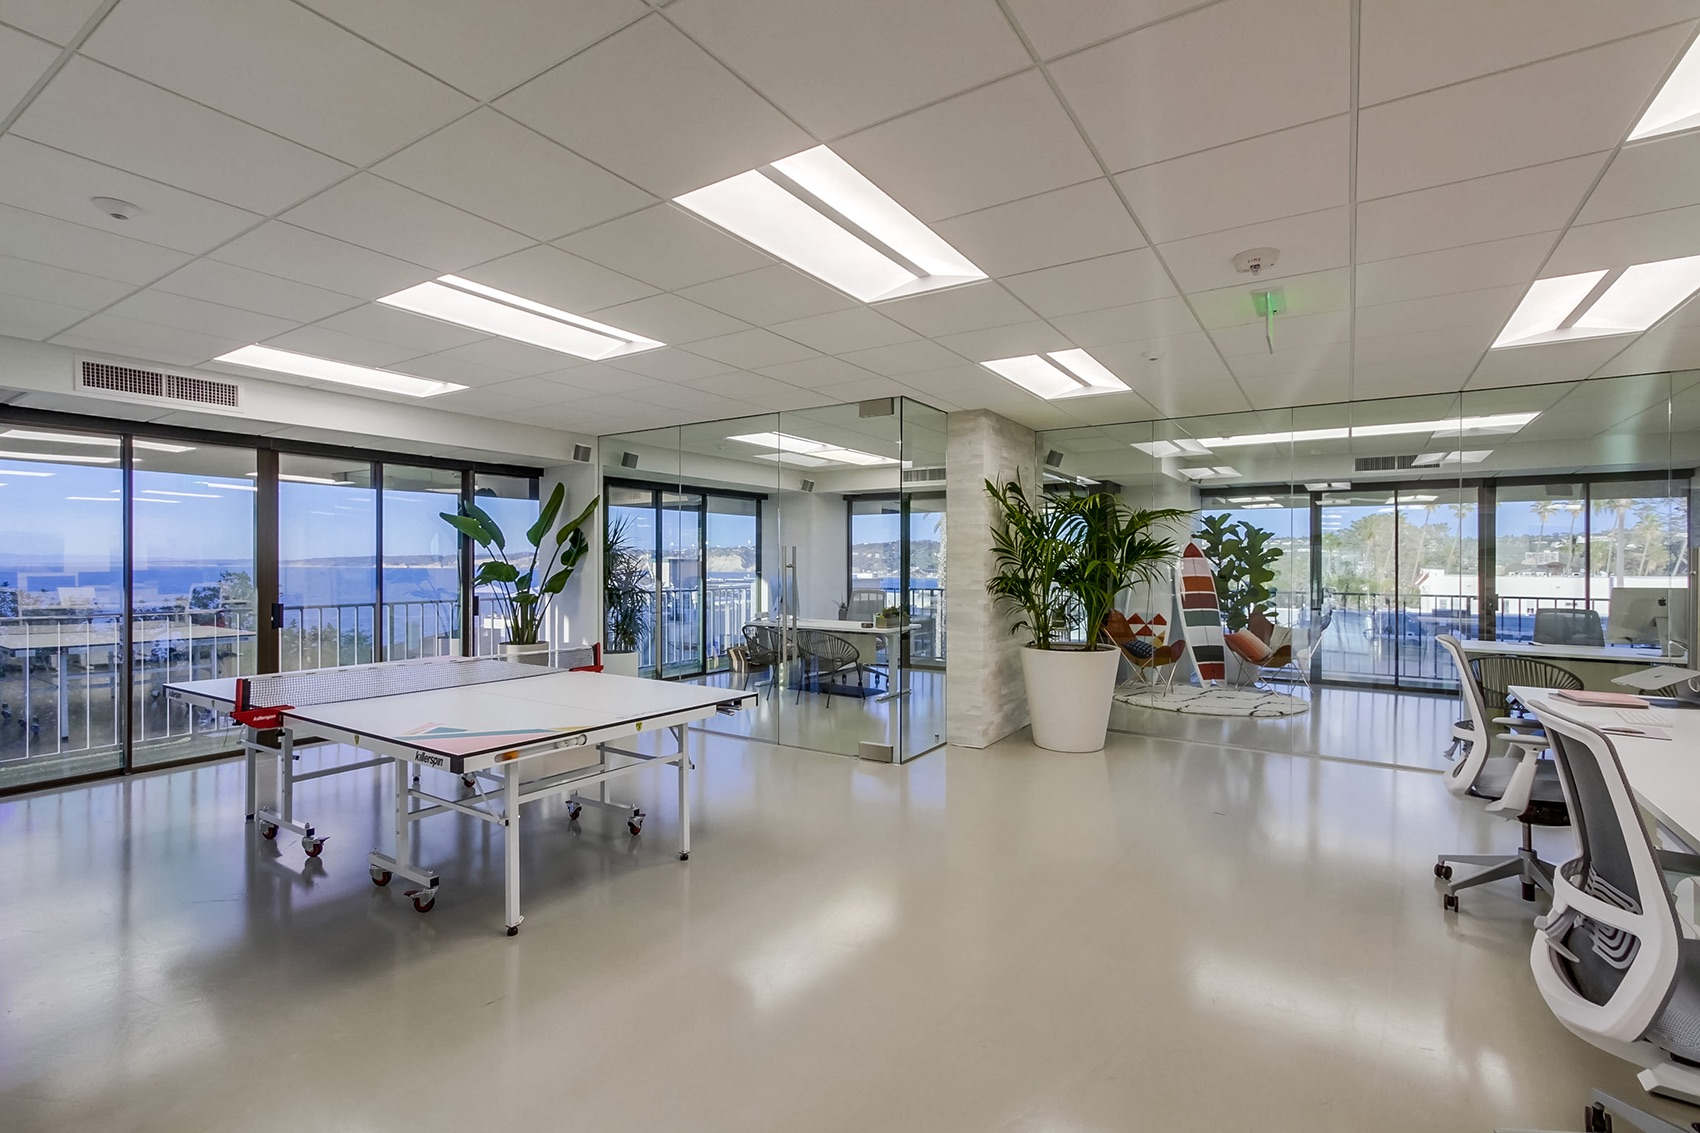 Inside Pura Vida Bracelets' New San Diego Headquarters